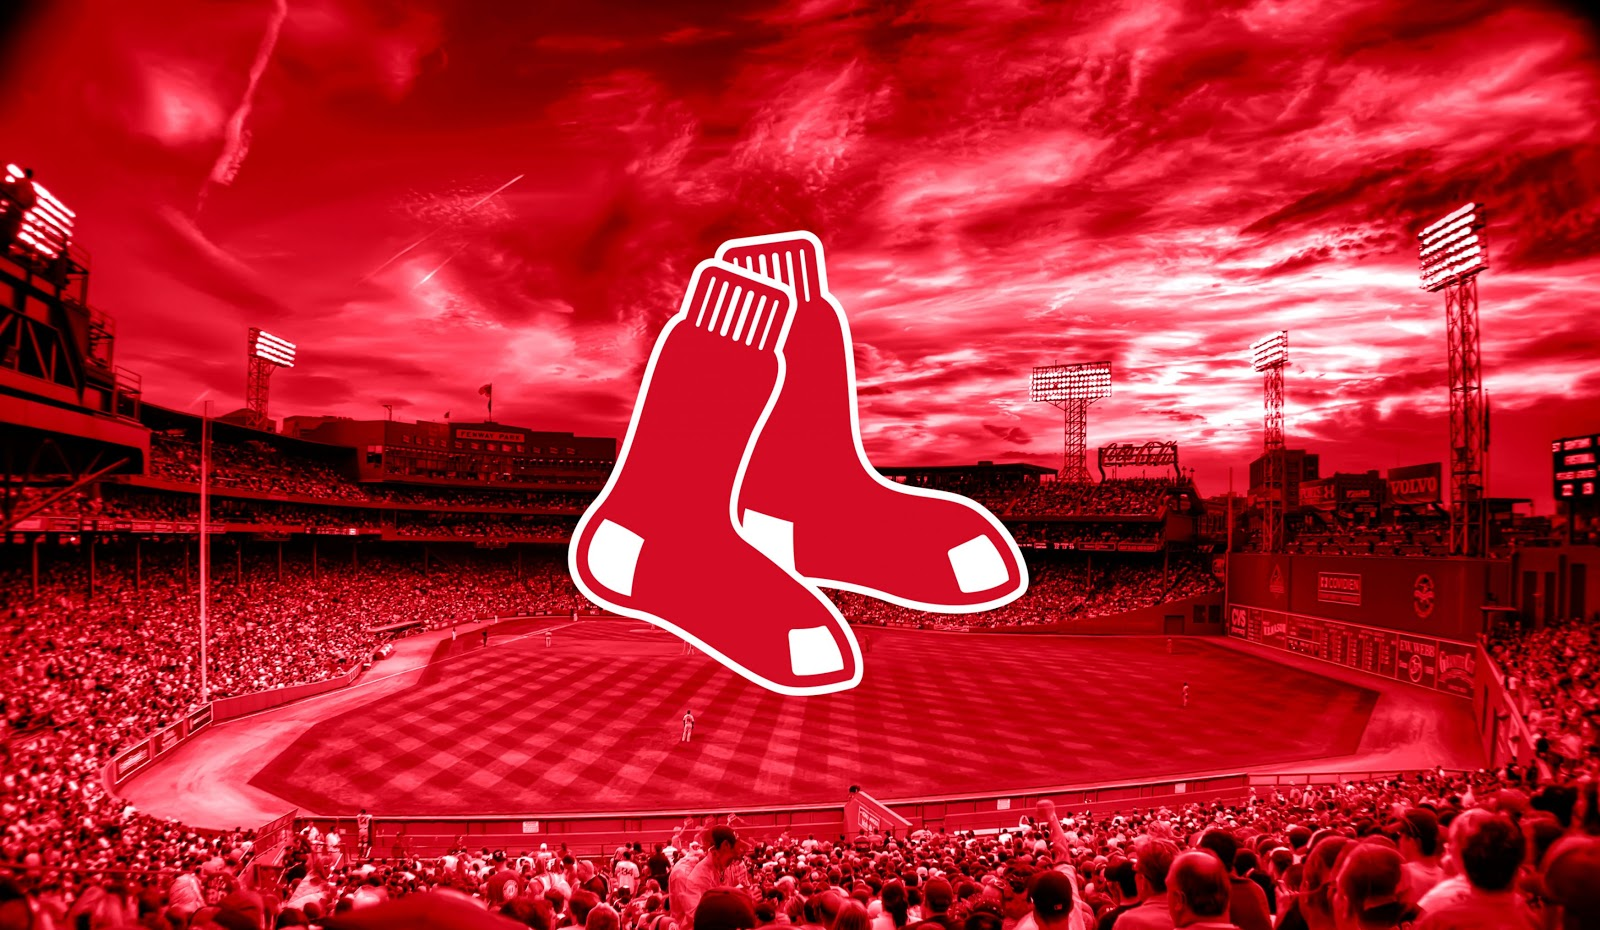 Boston Red Sox Hd Background Wallpaper Wallpapers Ninja 1600x930